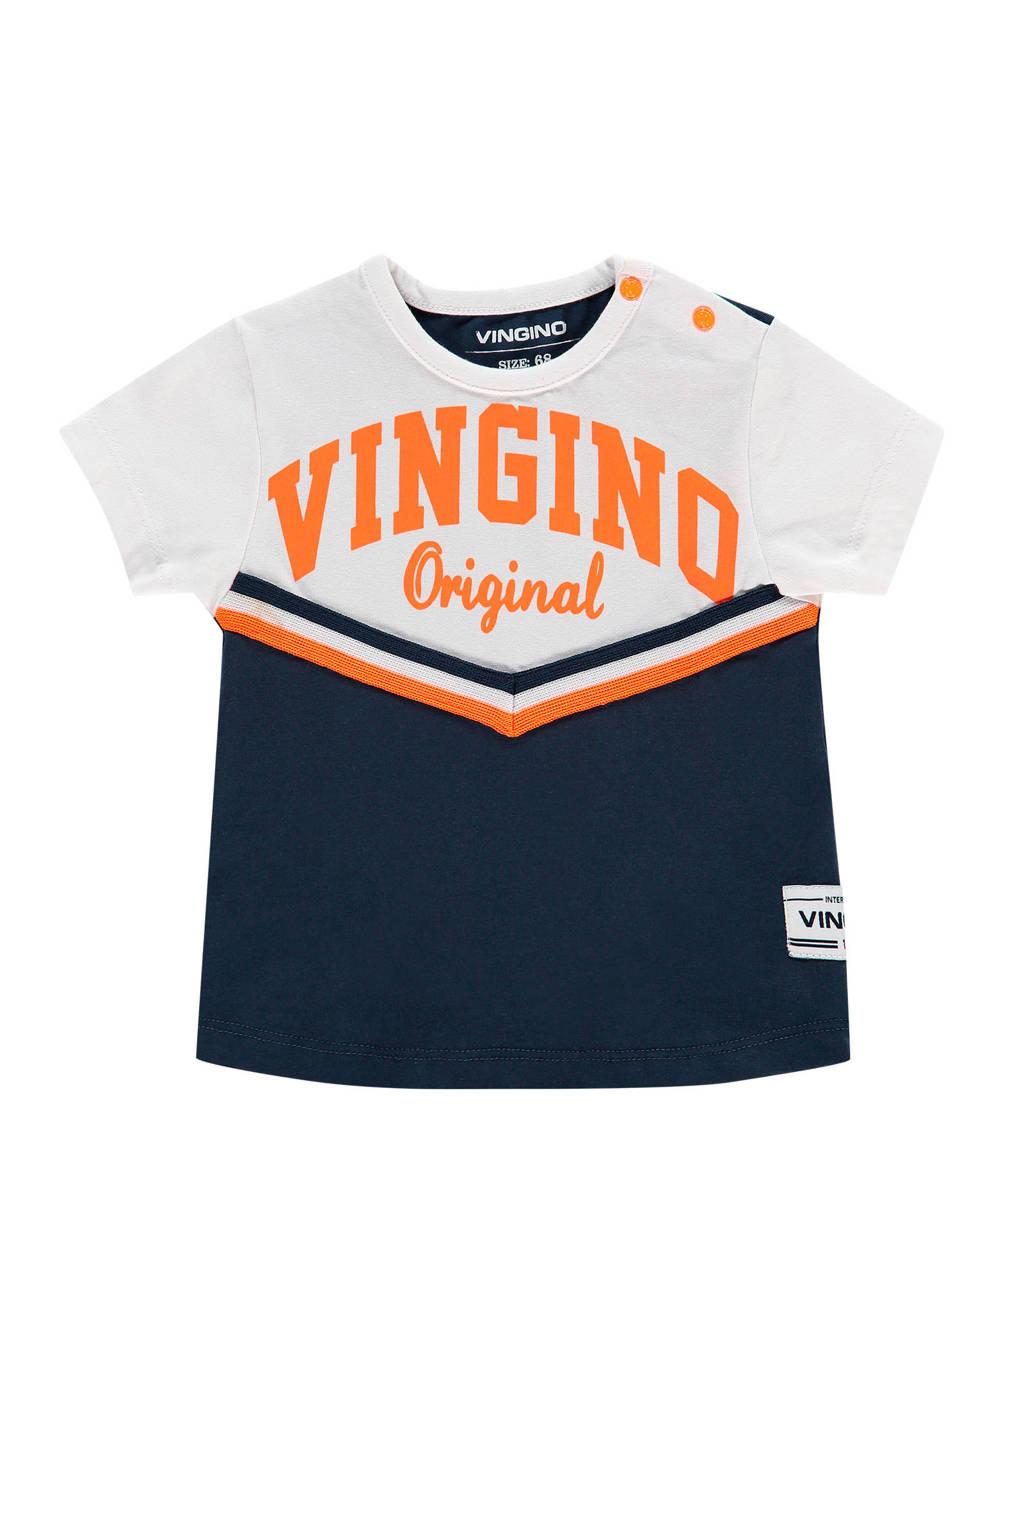 Vingino T-shirt Horter mini met logo donkerblauw/wit/oranje, Donkerblauw/wit/oranje